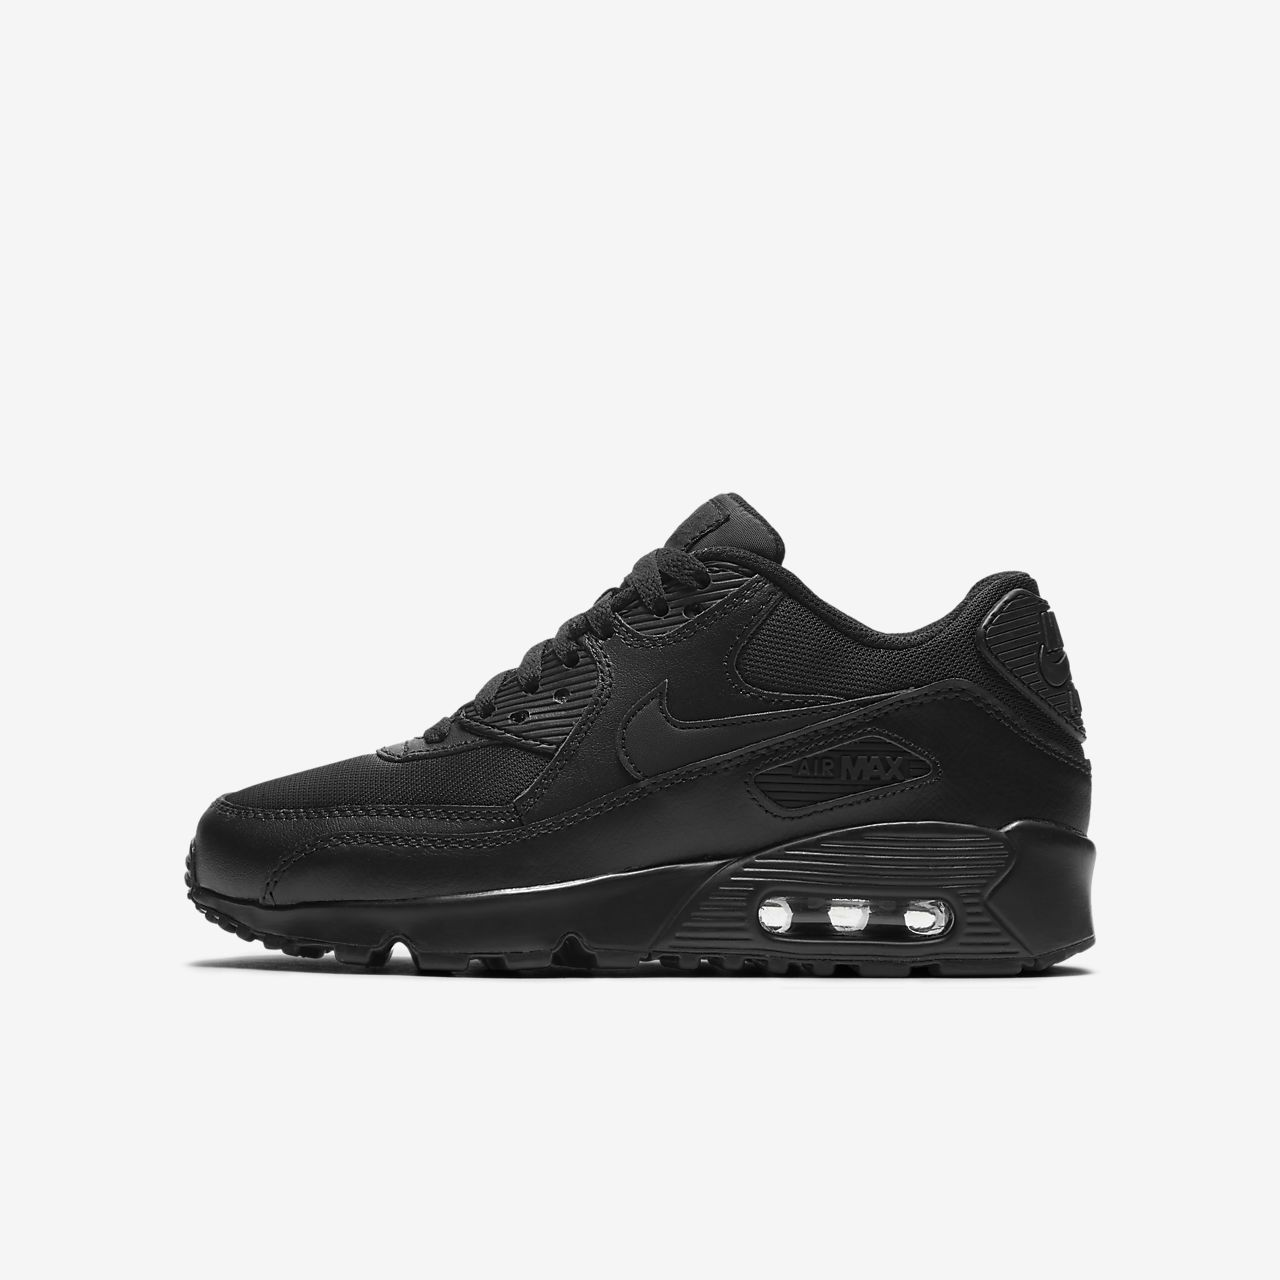 Casual 38 Skabwrci Nike Whirlse 90 Air Chaussures Max Enfant Ix4XTfqw